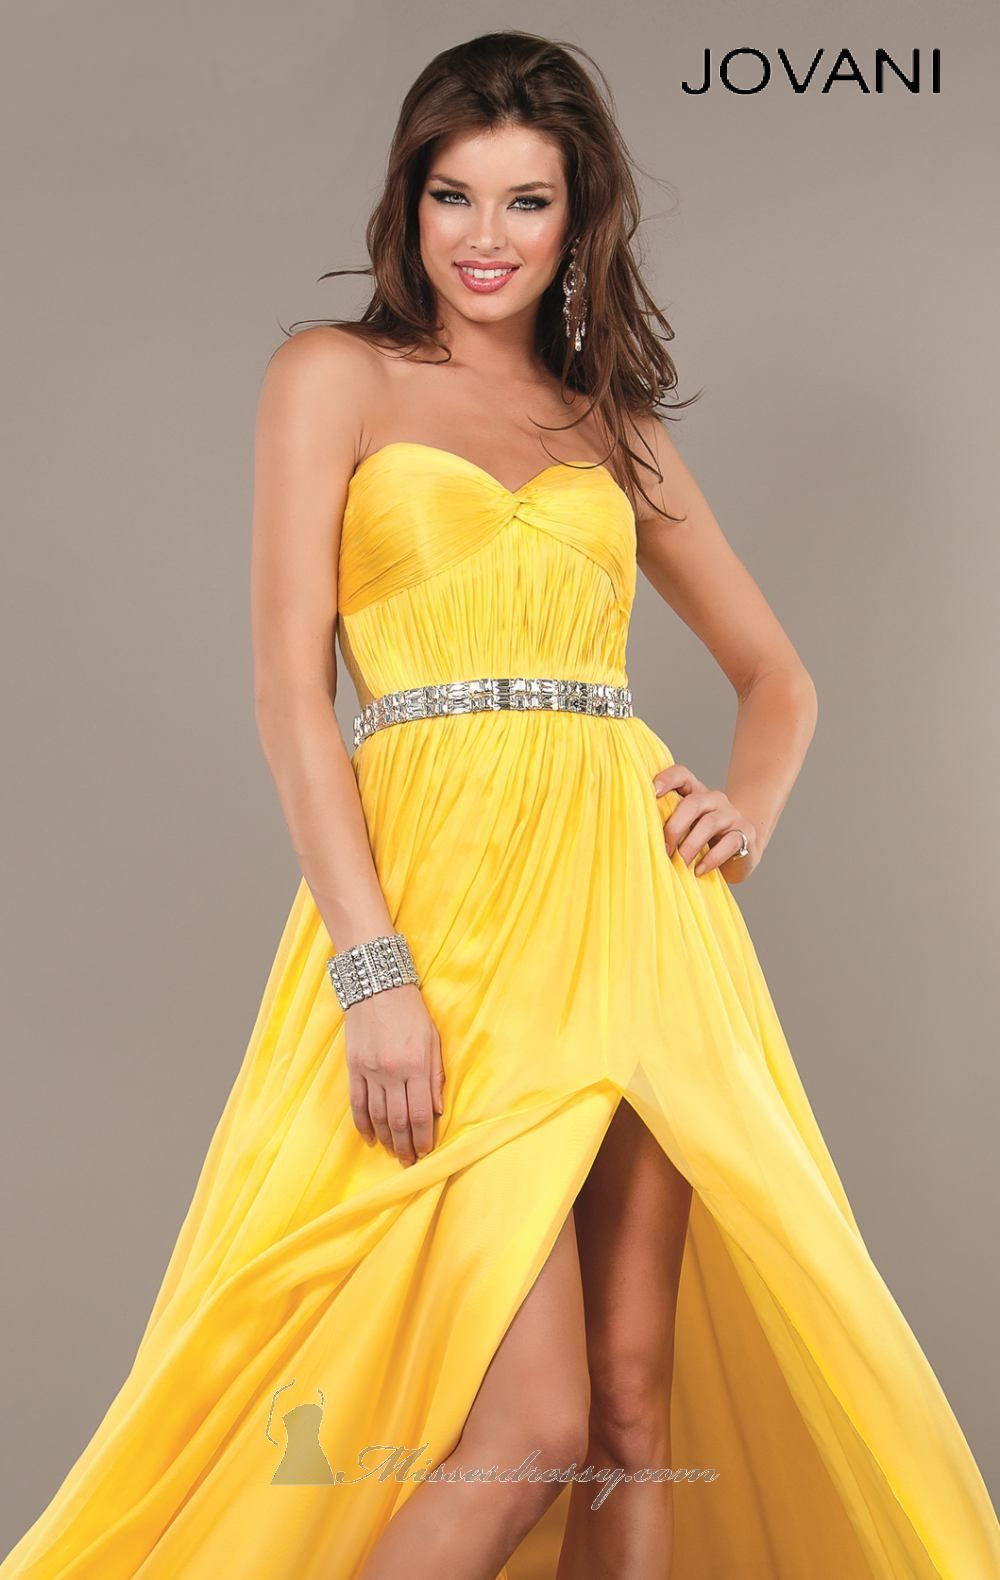 Jovani prom dress belle pinterest prom sweetheart dress and